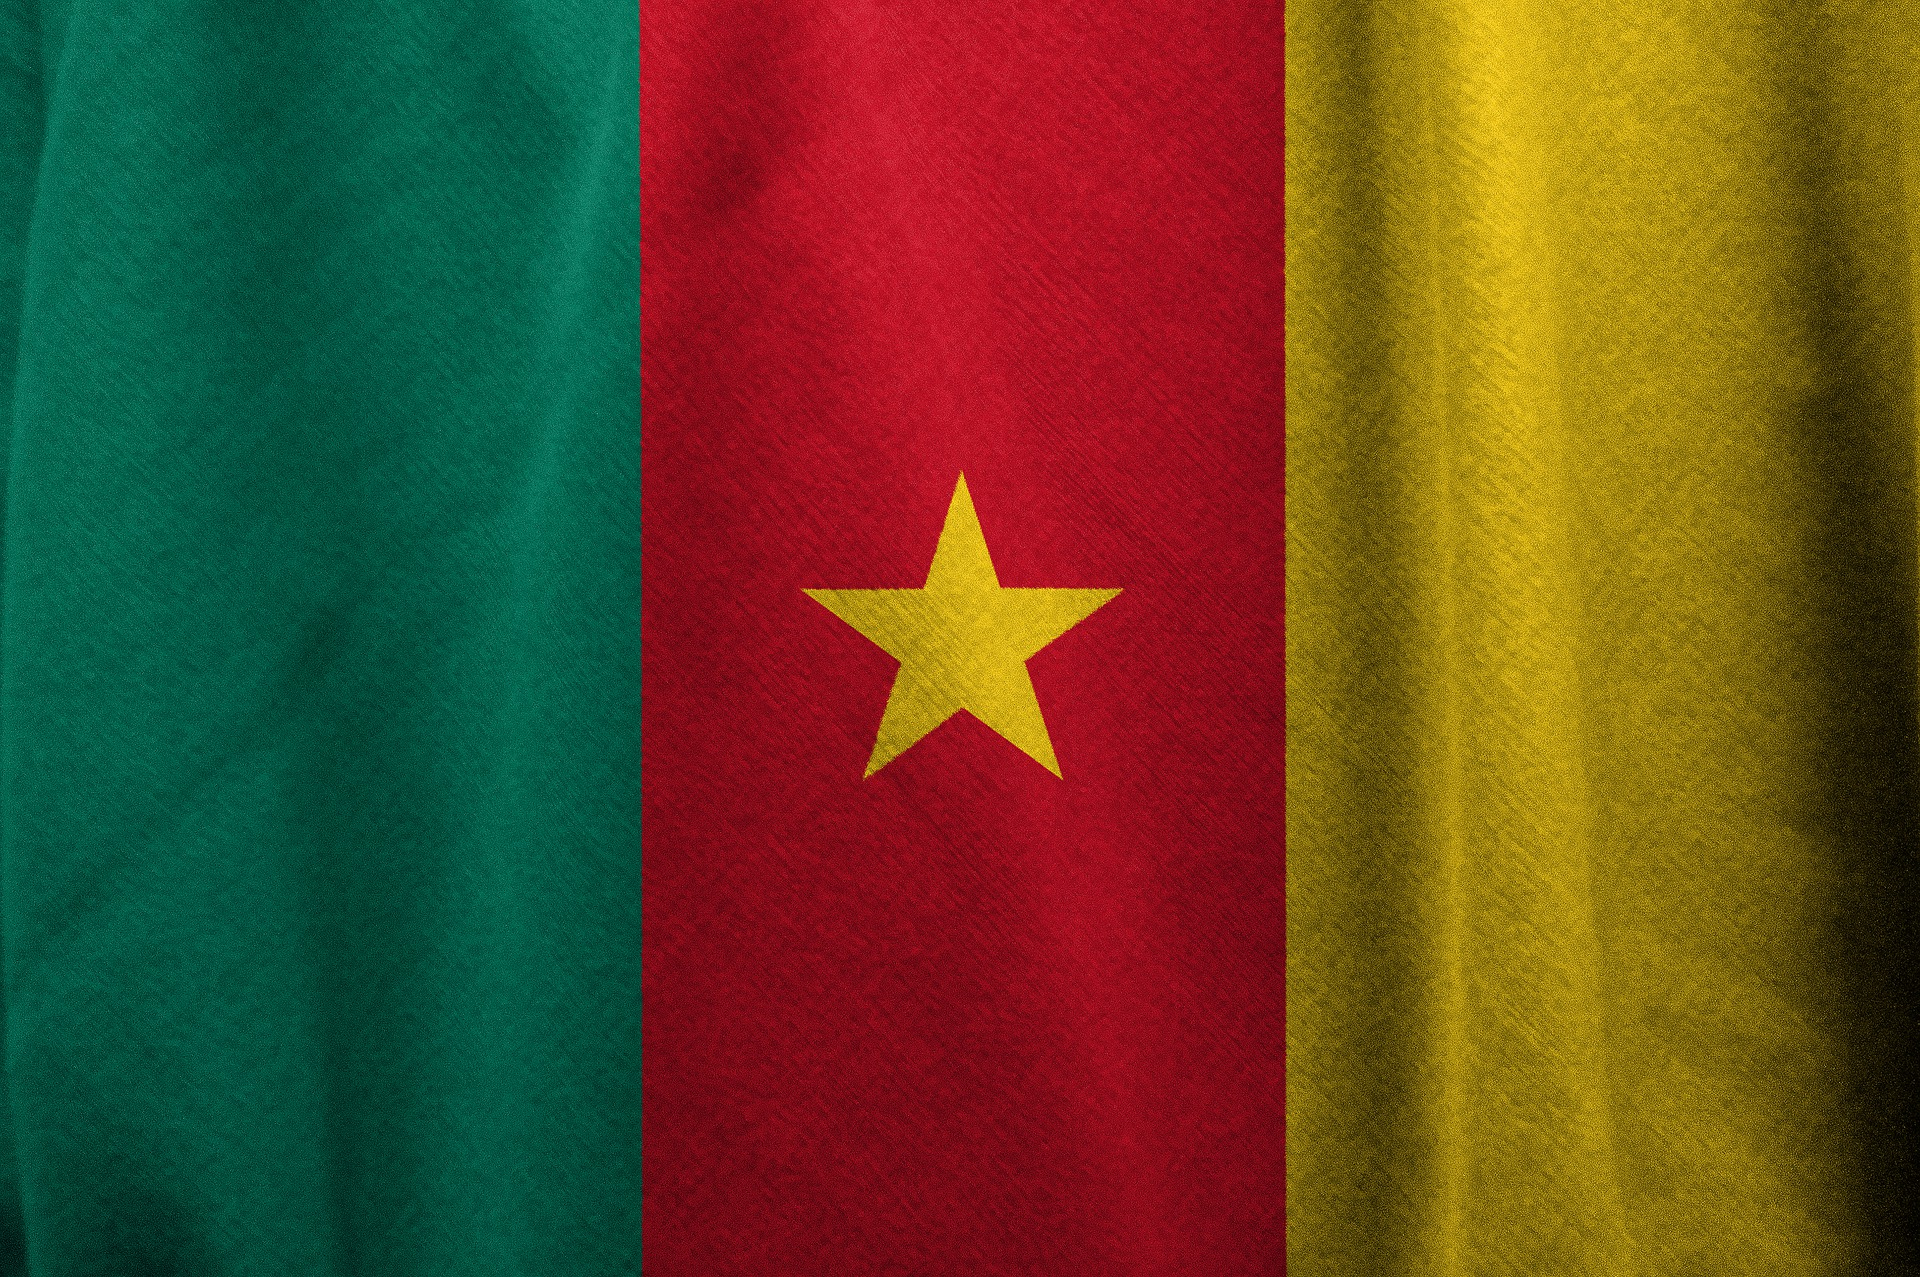 Trademark application Cameroon